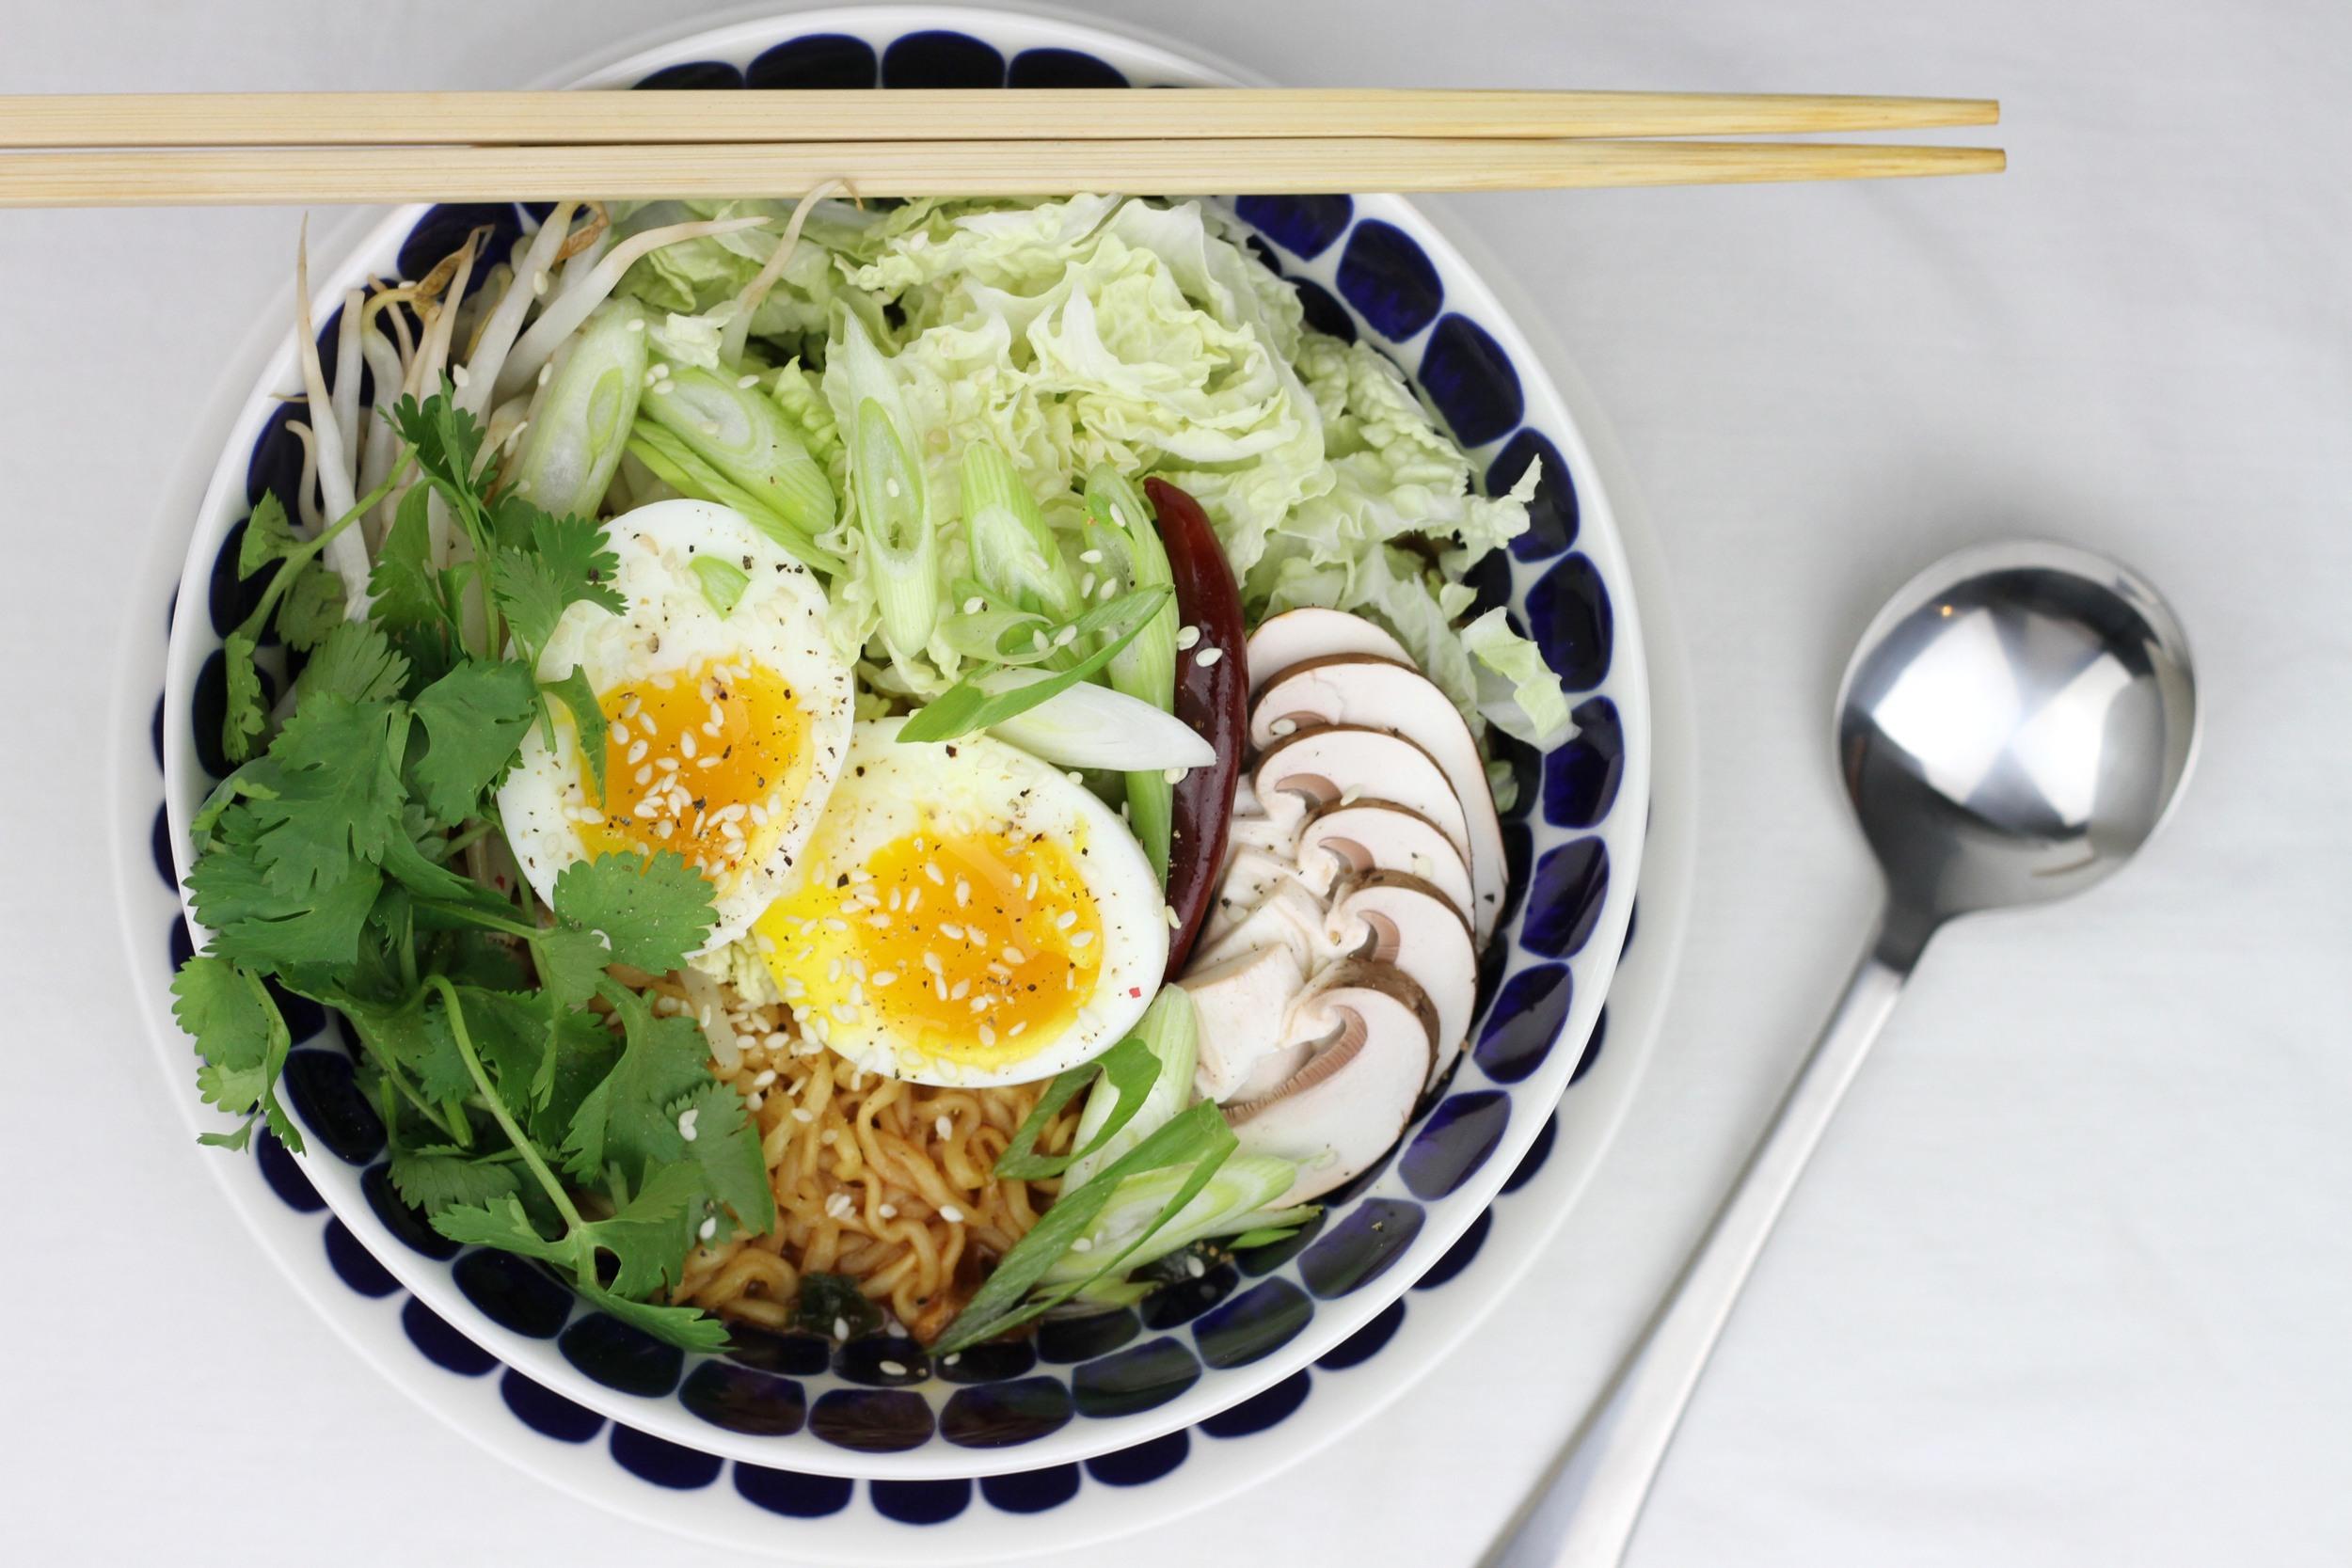 Arabia  24H Tuokio soup bowl  and  salad plate .  David Mellor Classic soup spoon .